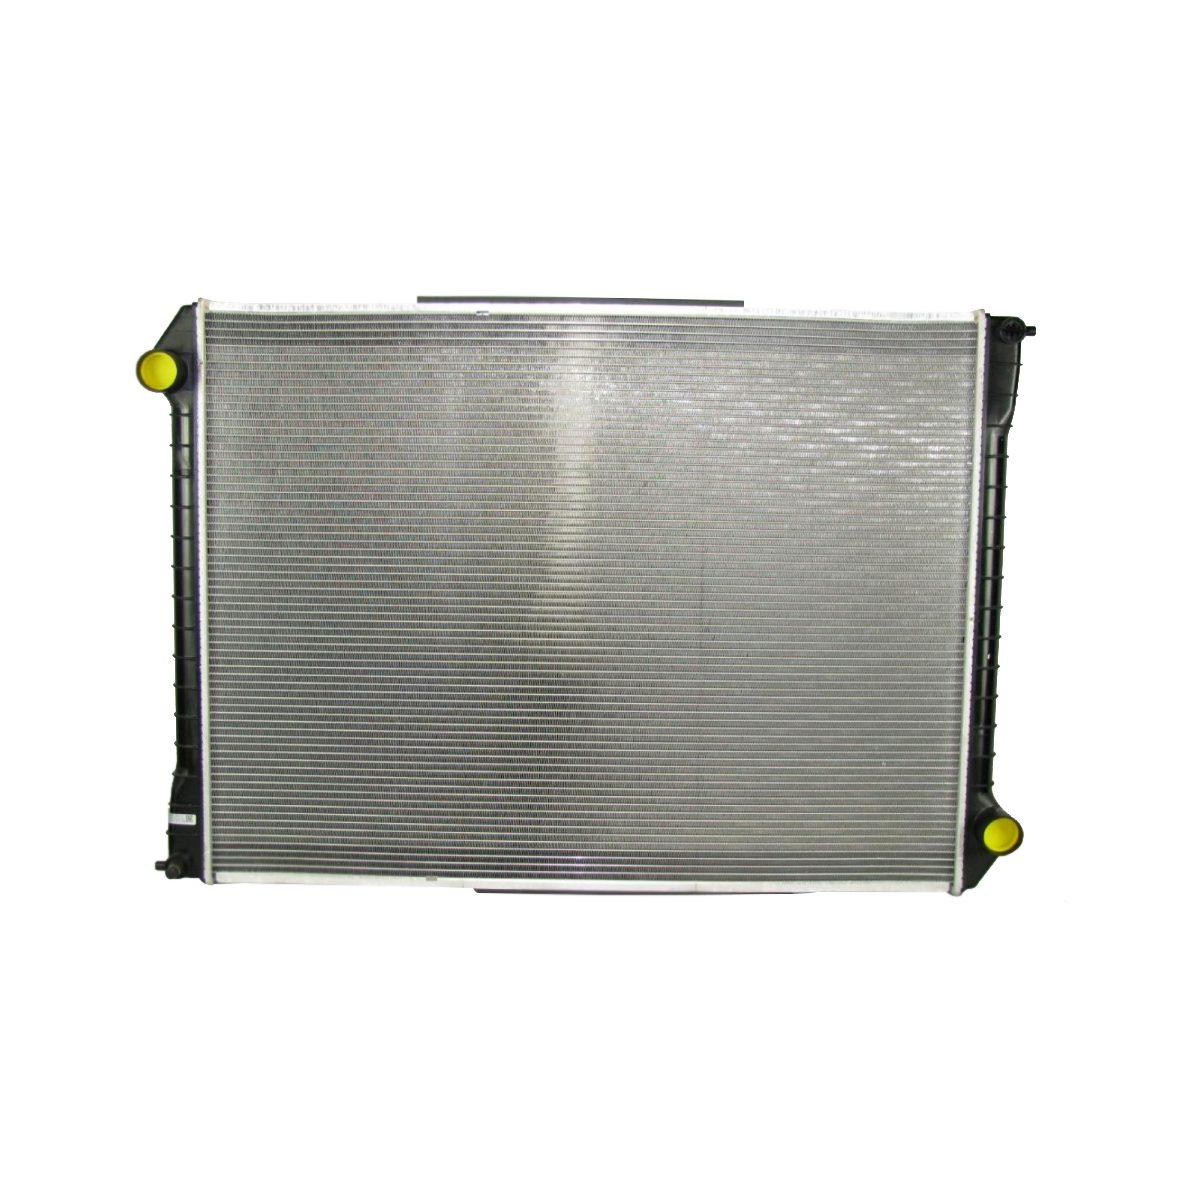 ford l ln ltl cl series 88 90 radiator oem e8ht8009g